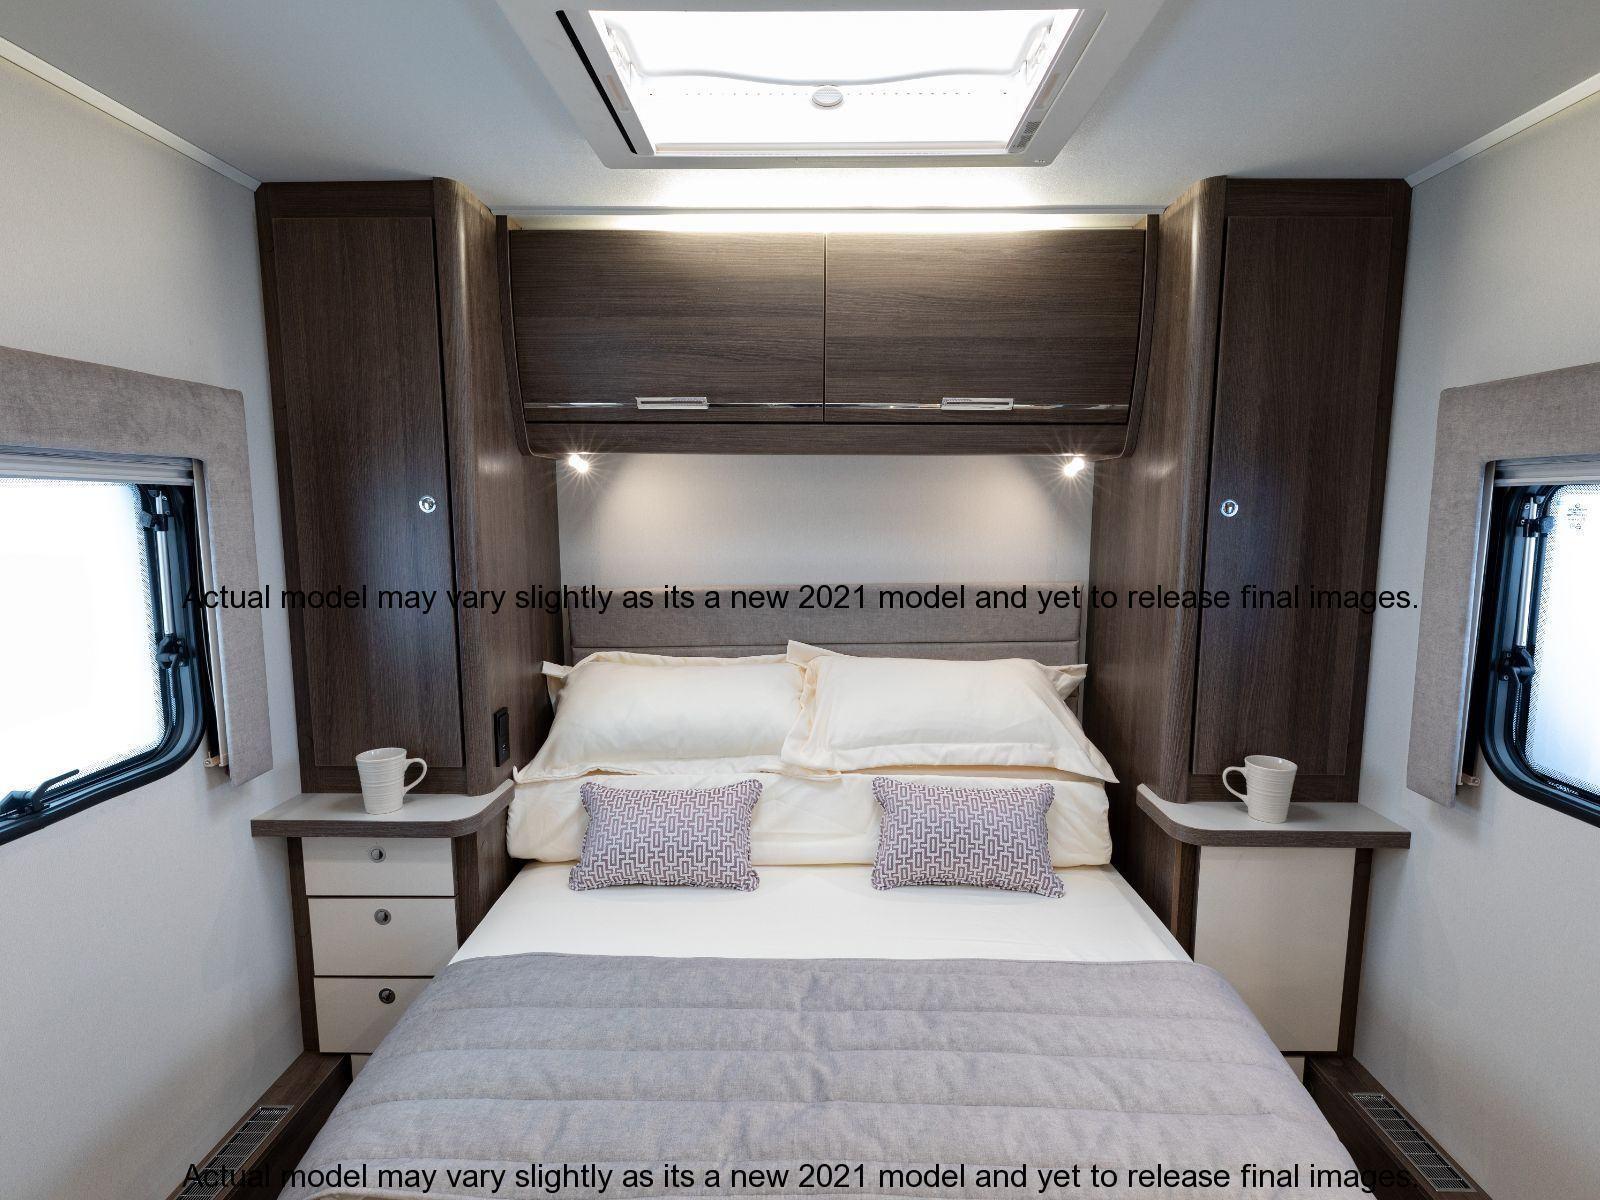 Elddis_150_Venture_Motorhome_interior5